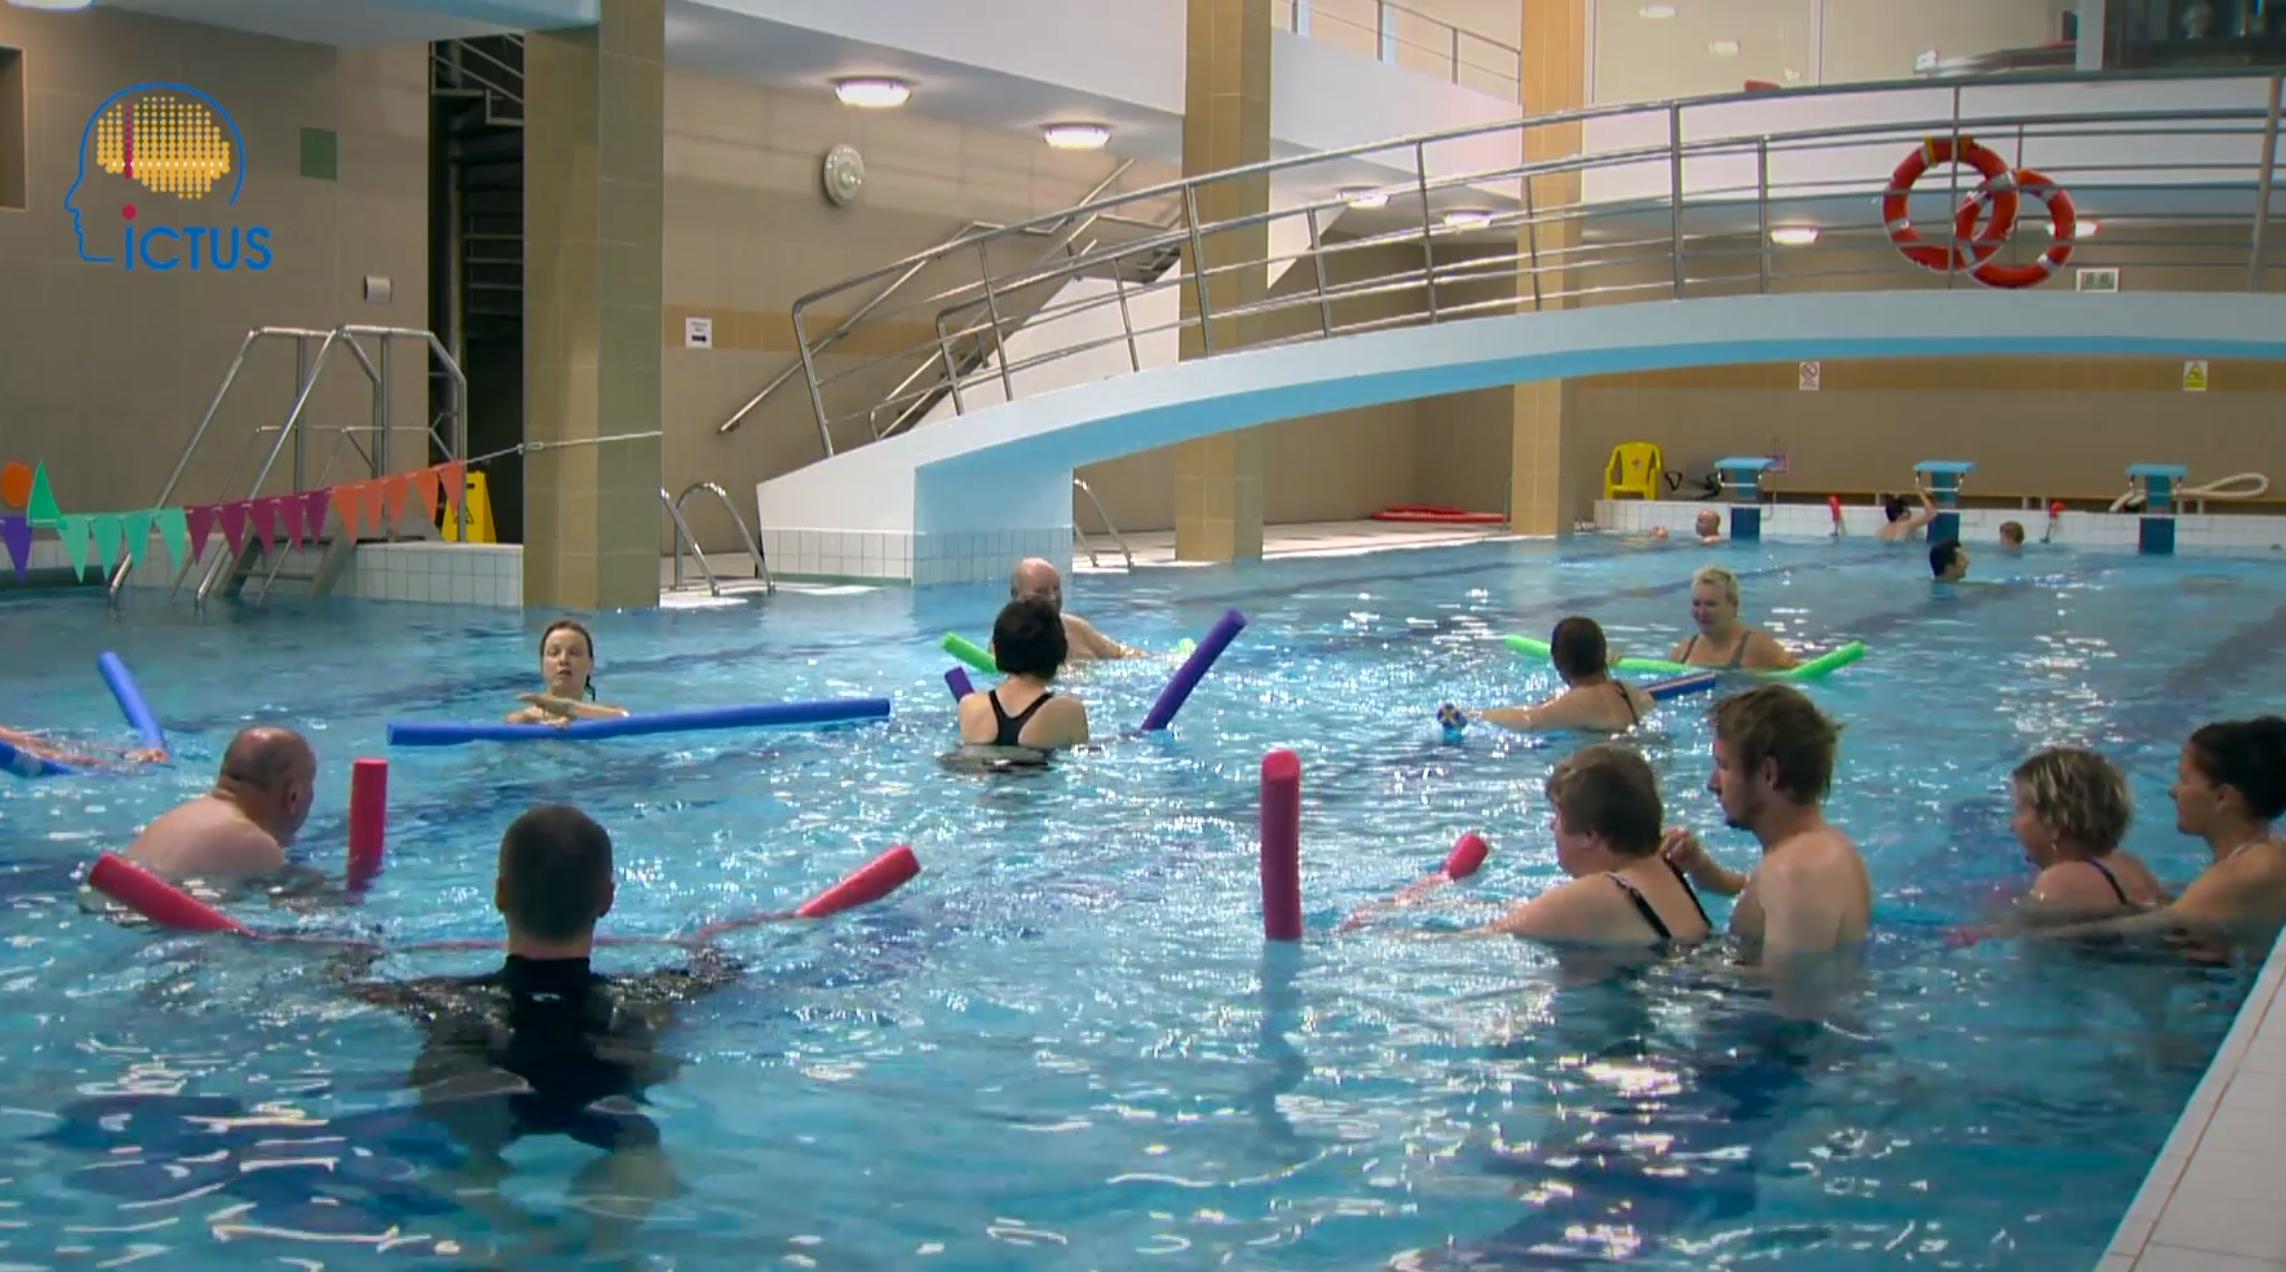 ICTUS-Swimming-2.jpg-kKU%2Babgf2Ypc8xcmkdxZpPC3.jpg